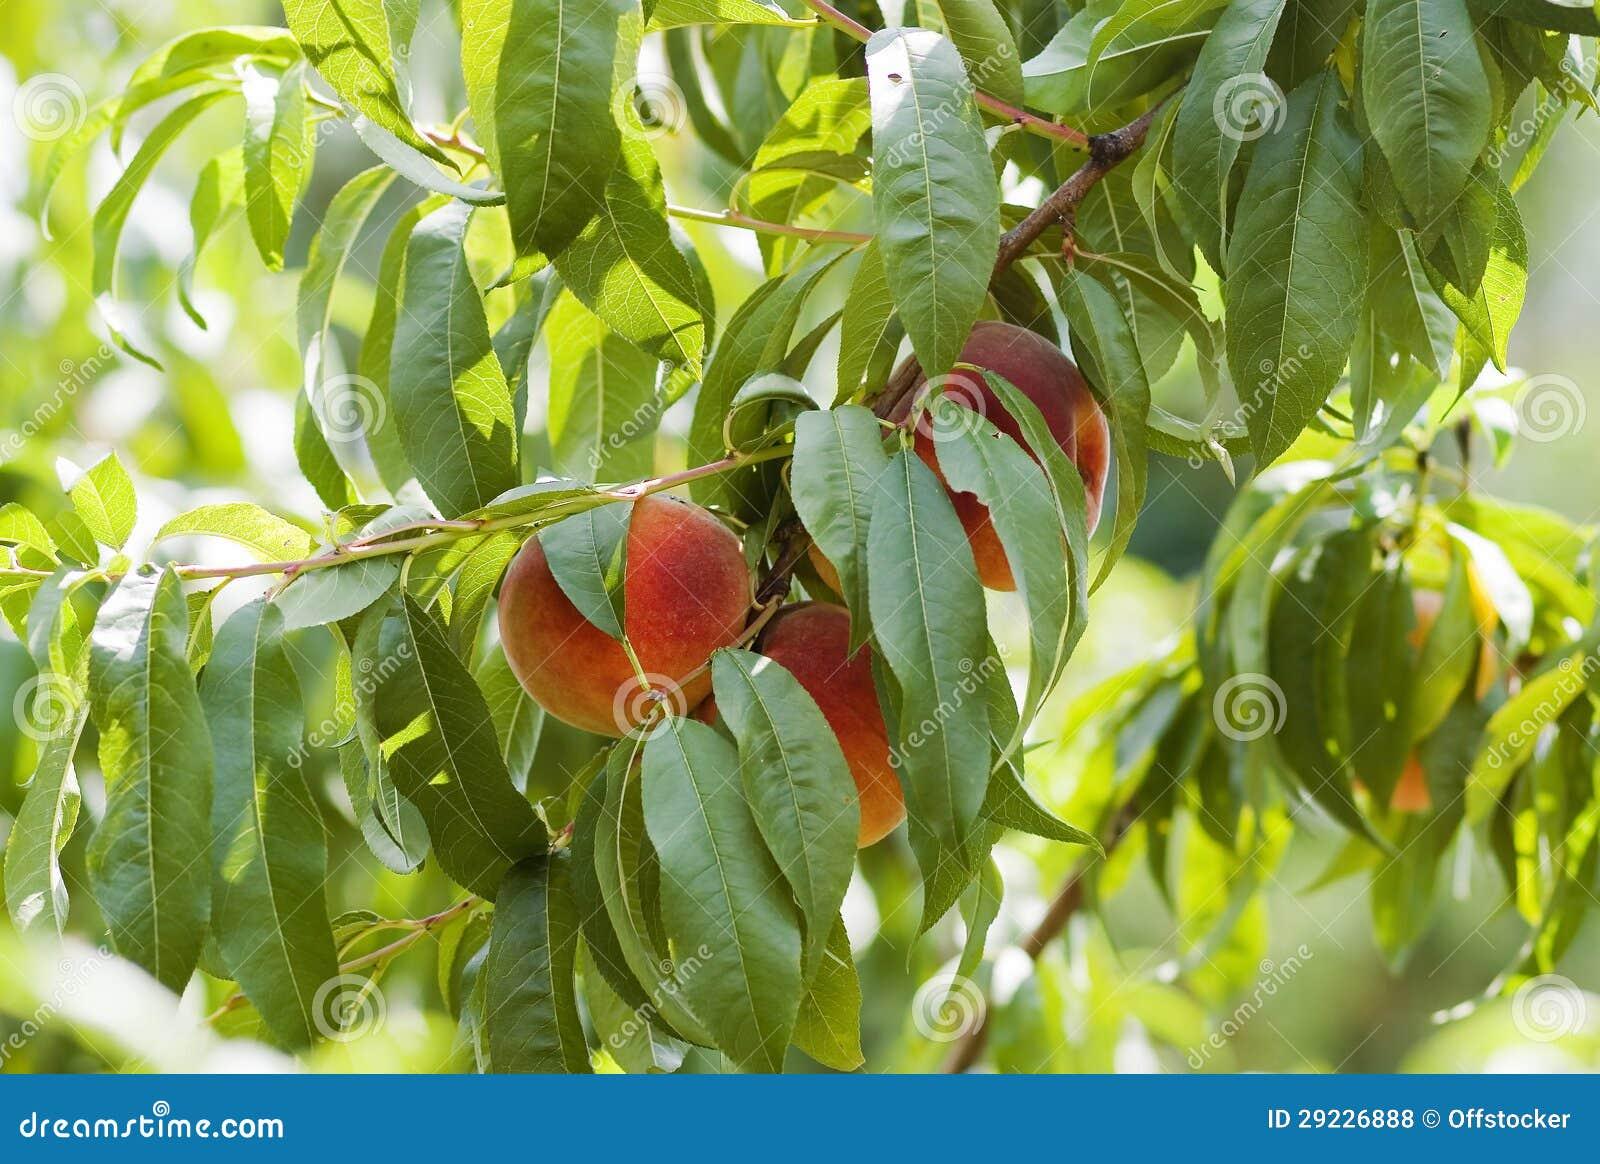 Download Pêssegos maduros foto de stock. Imagem de suculento, fruta - 29226888